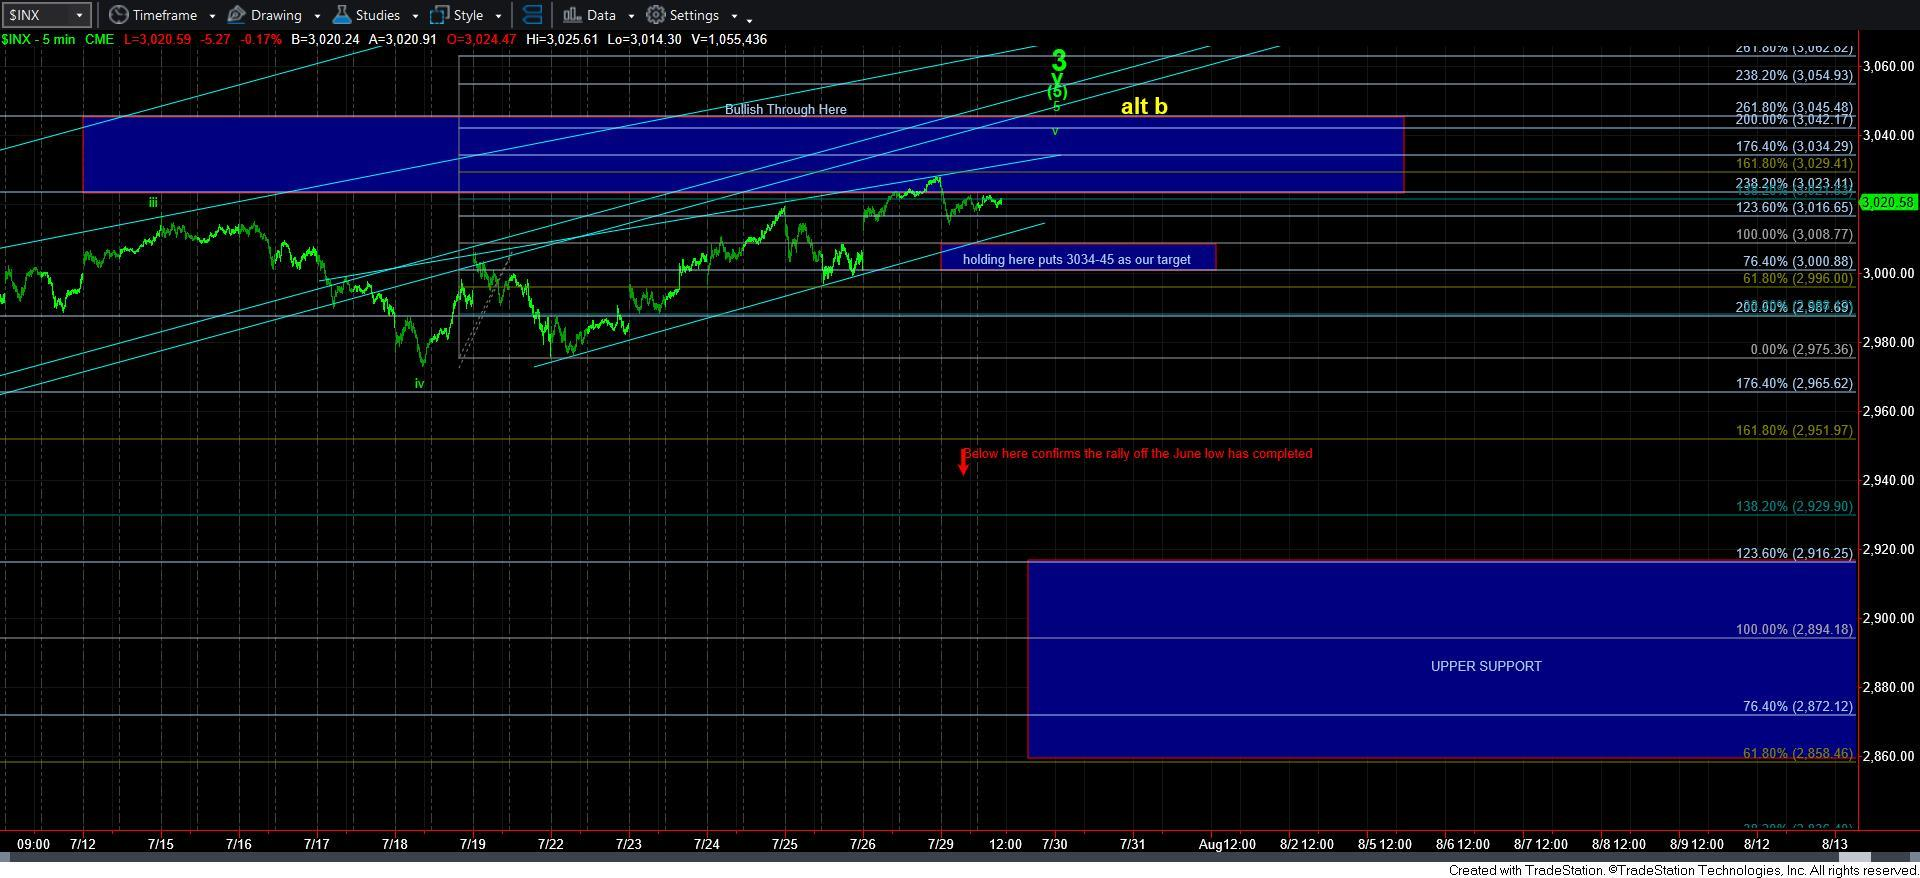 Will The Fed Awaken The Bears Again?